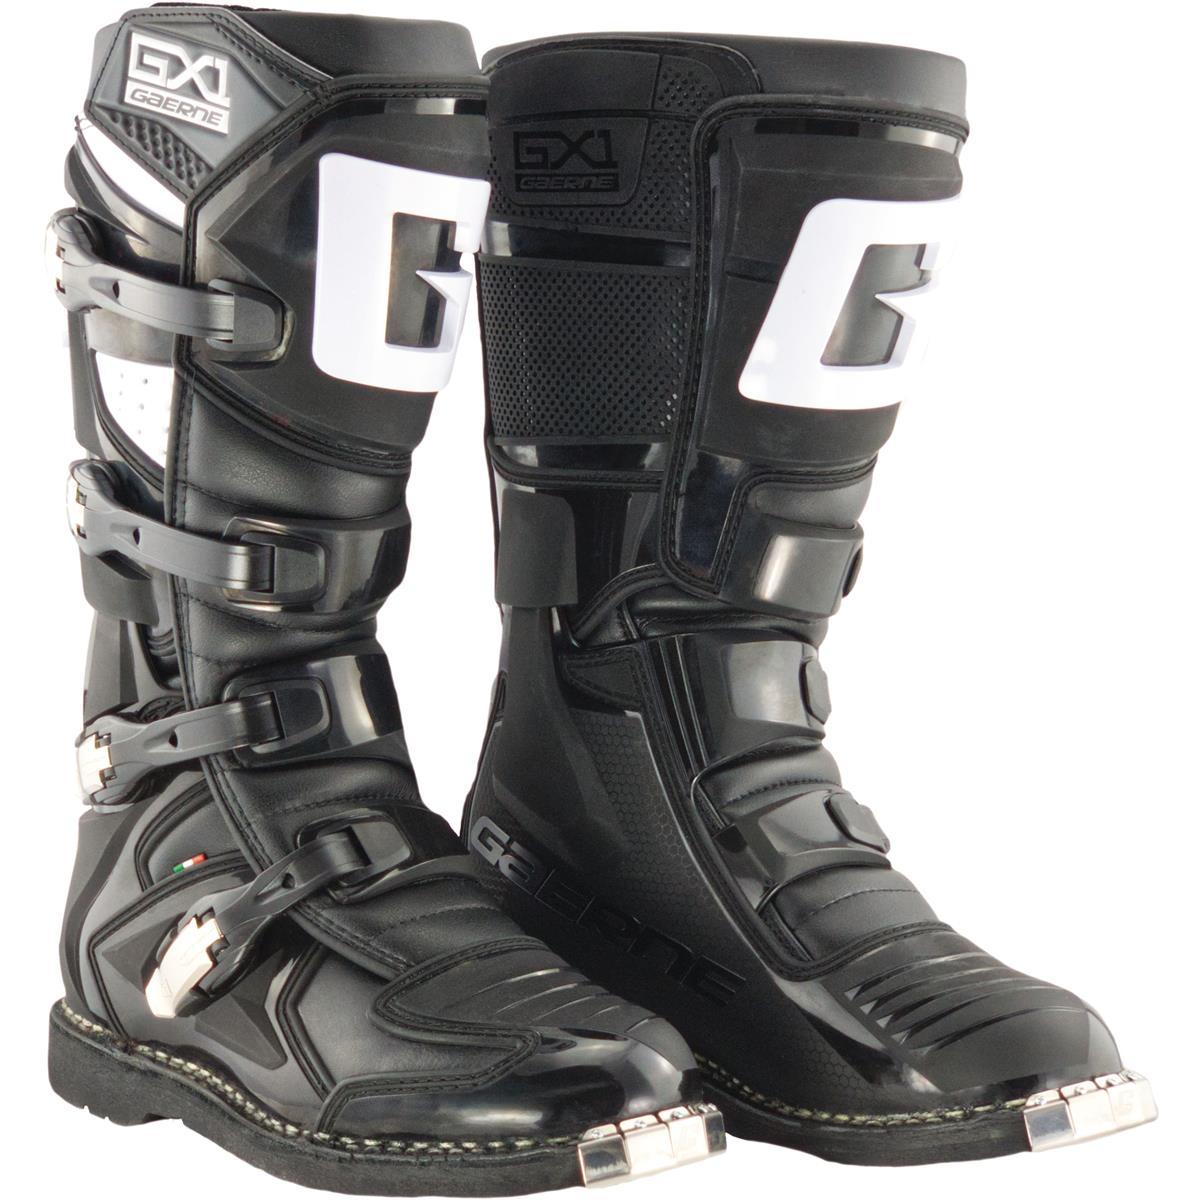 Gx Mx Boots Black Goodyear 1 Gaerne vfYy7bg6